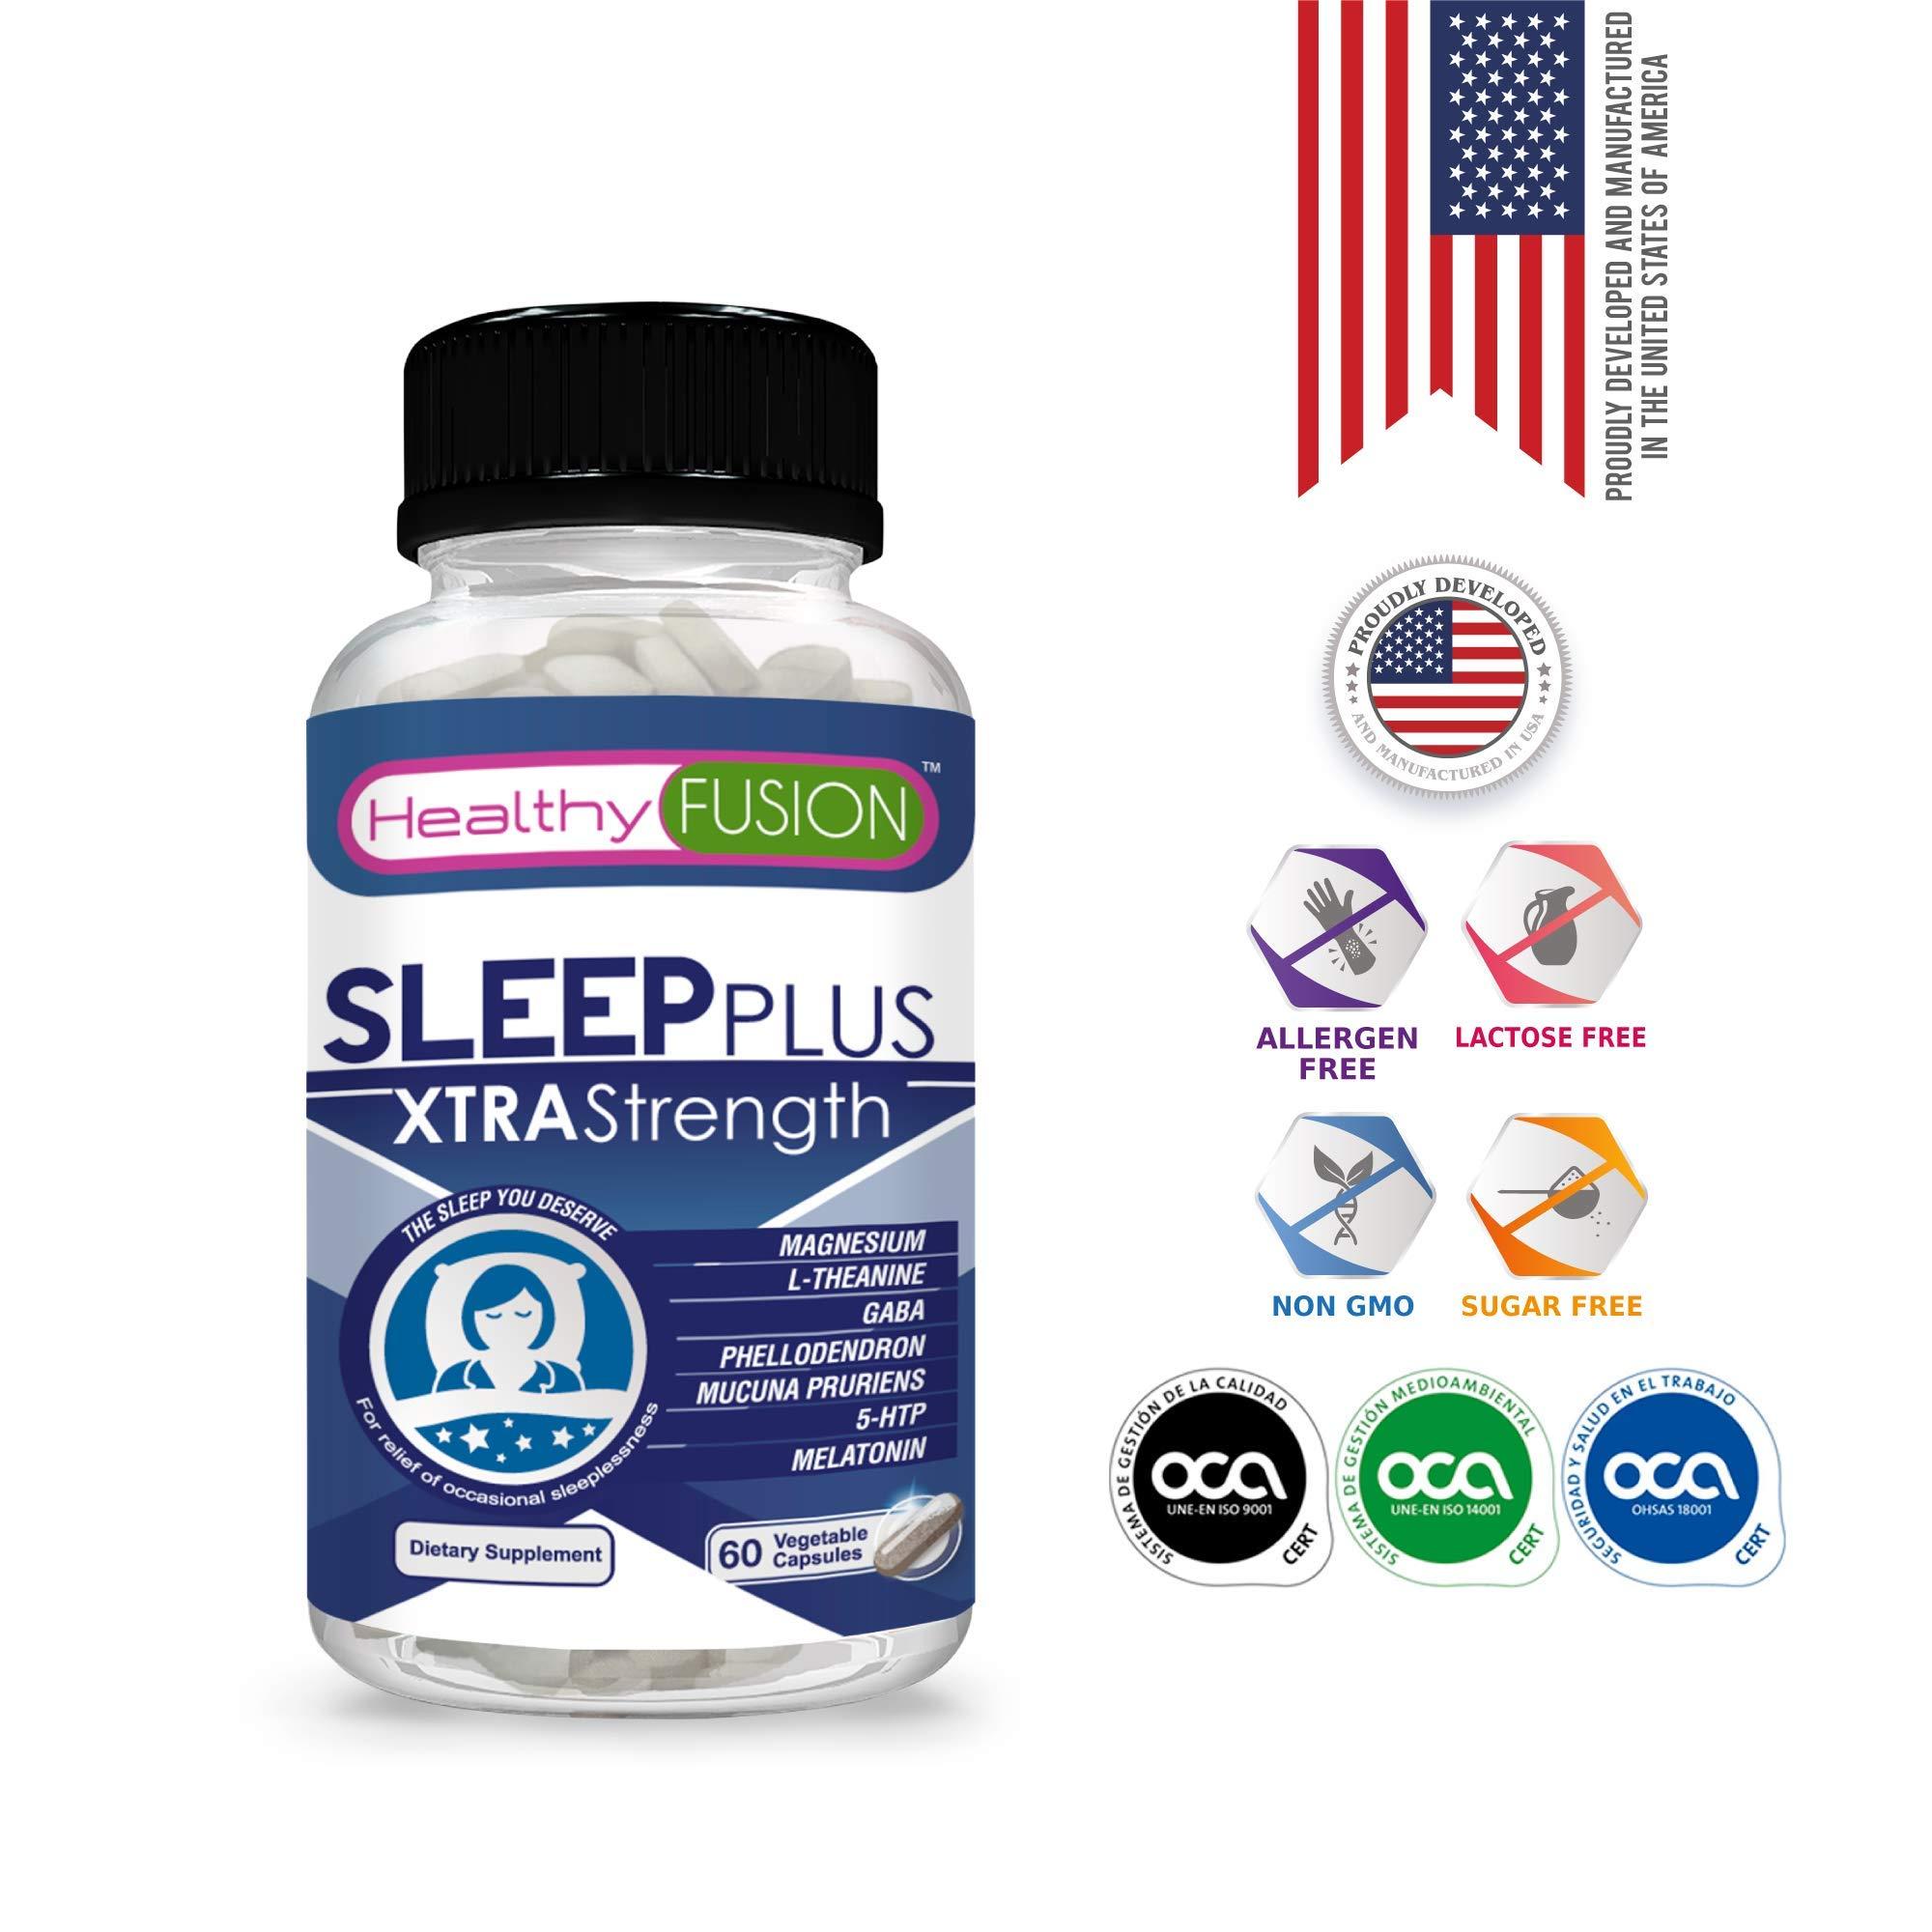 Sleep AID Extra Strength Phellodendron